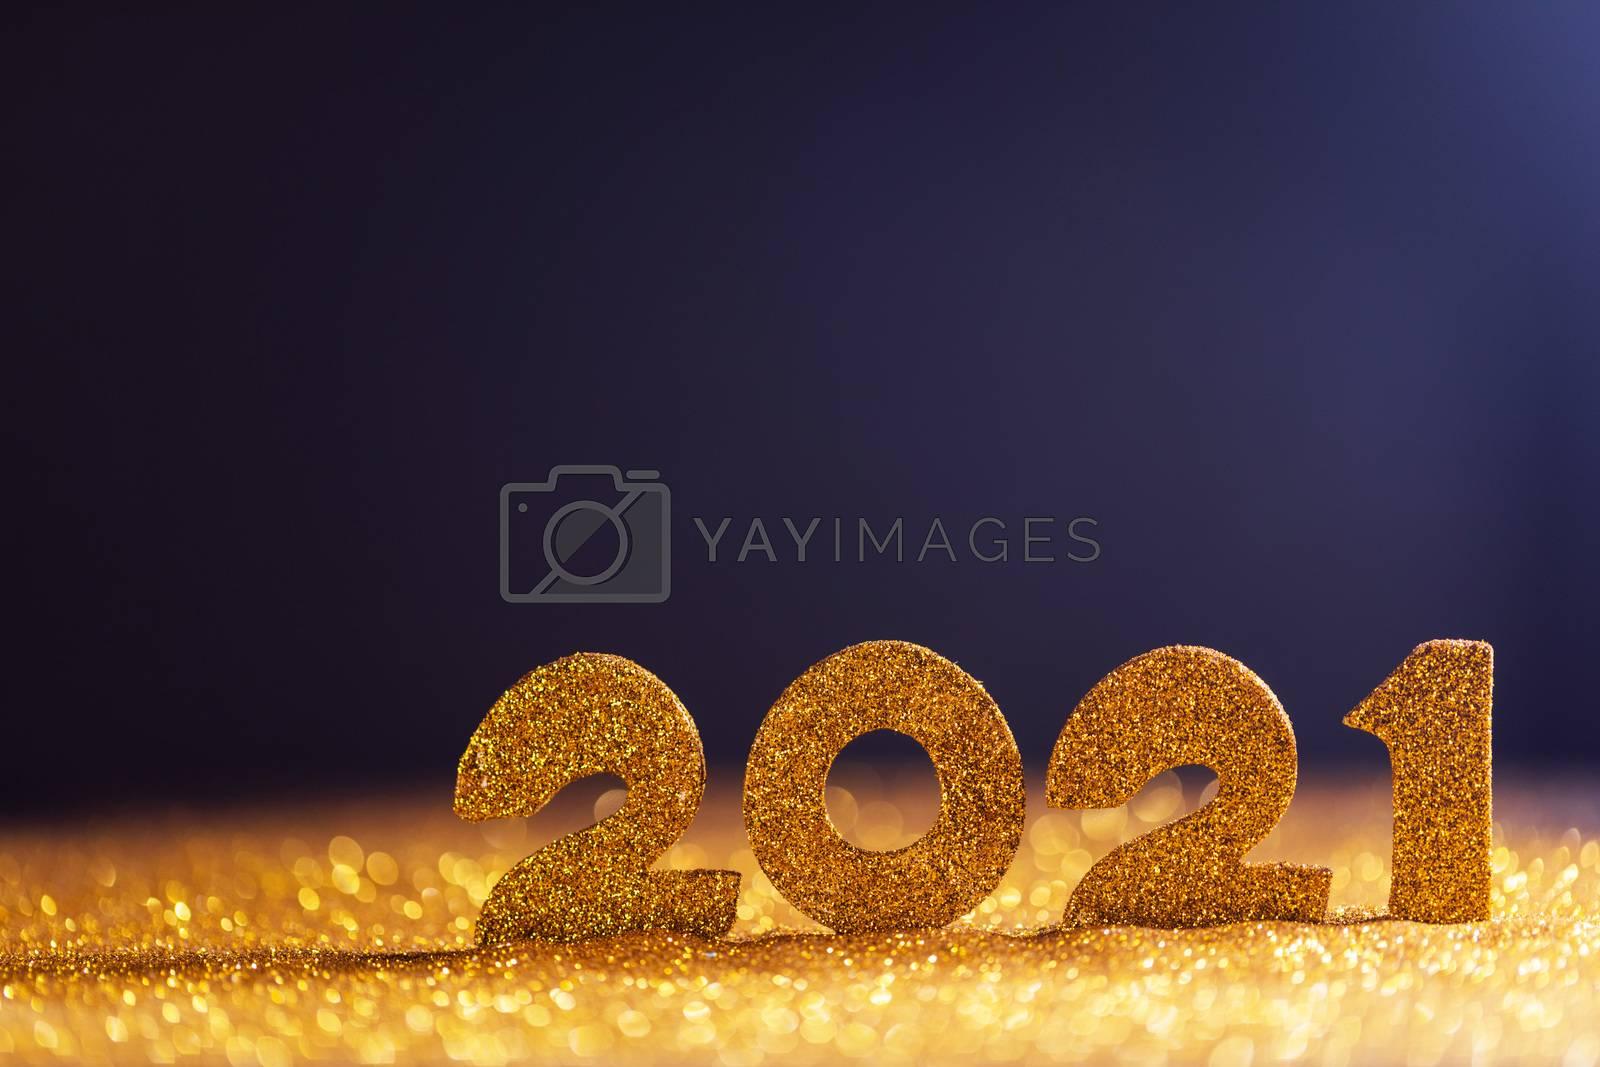 Happy new year 2021 celebration by Yellowj